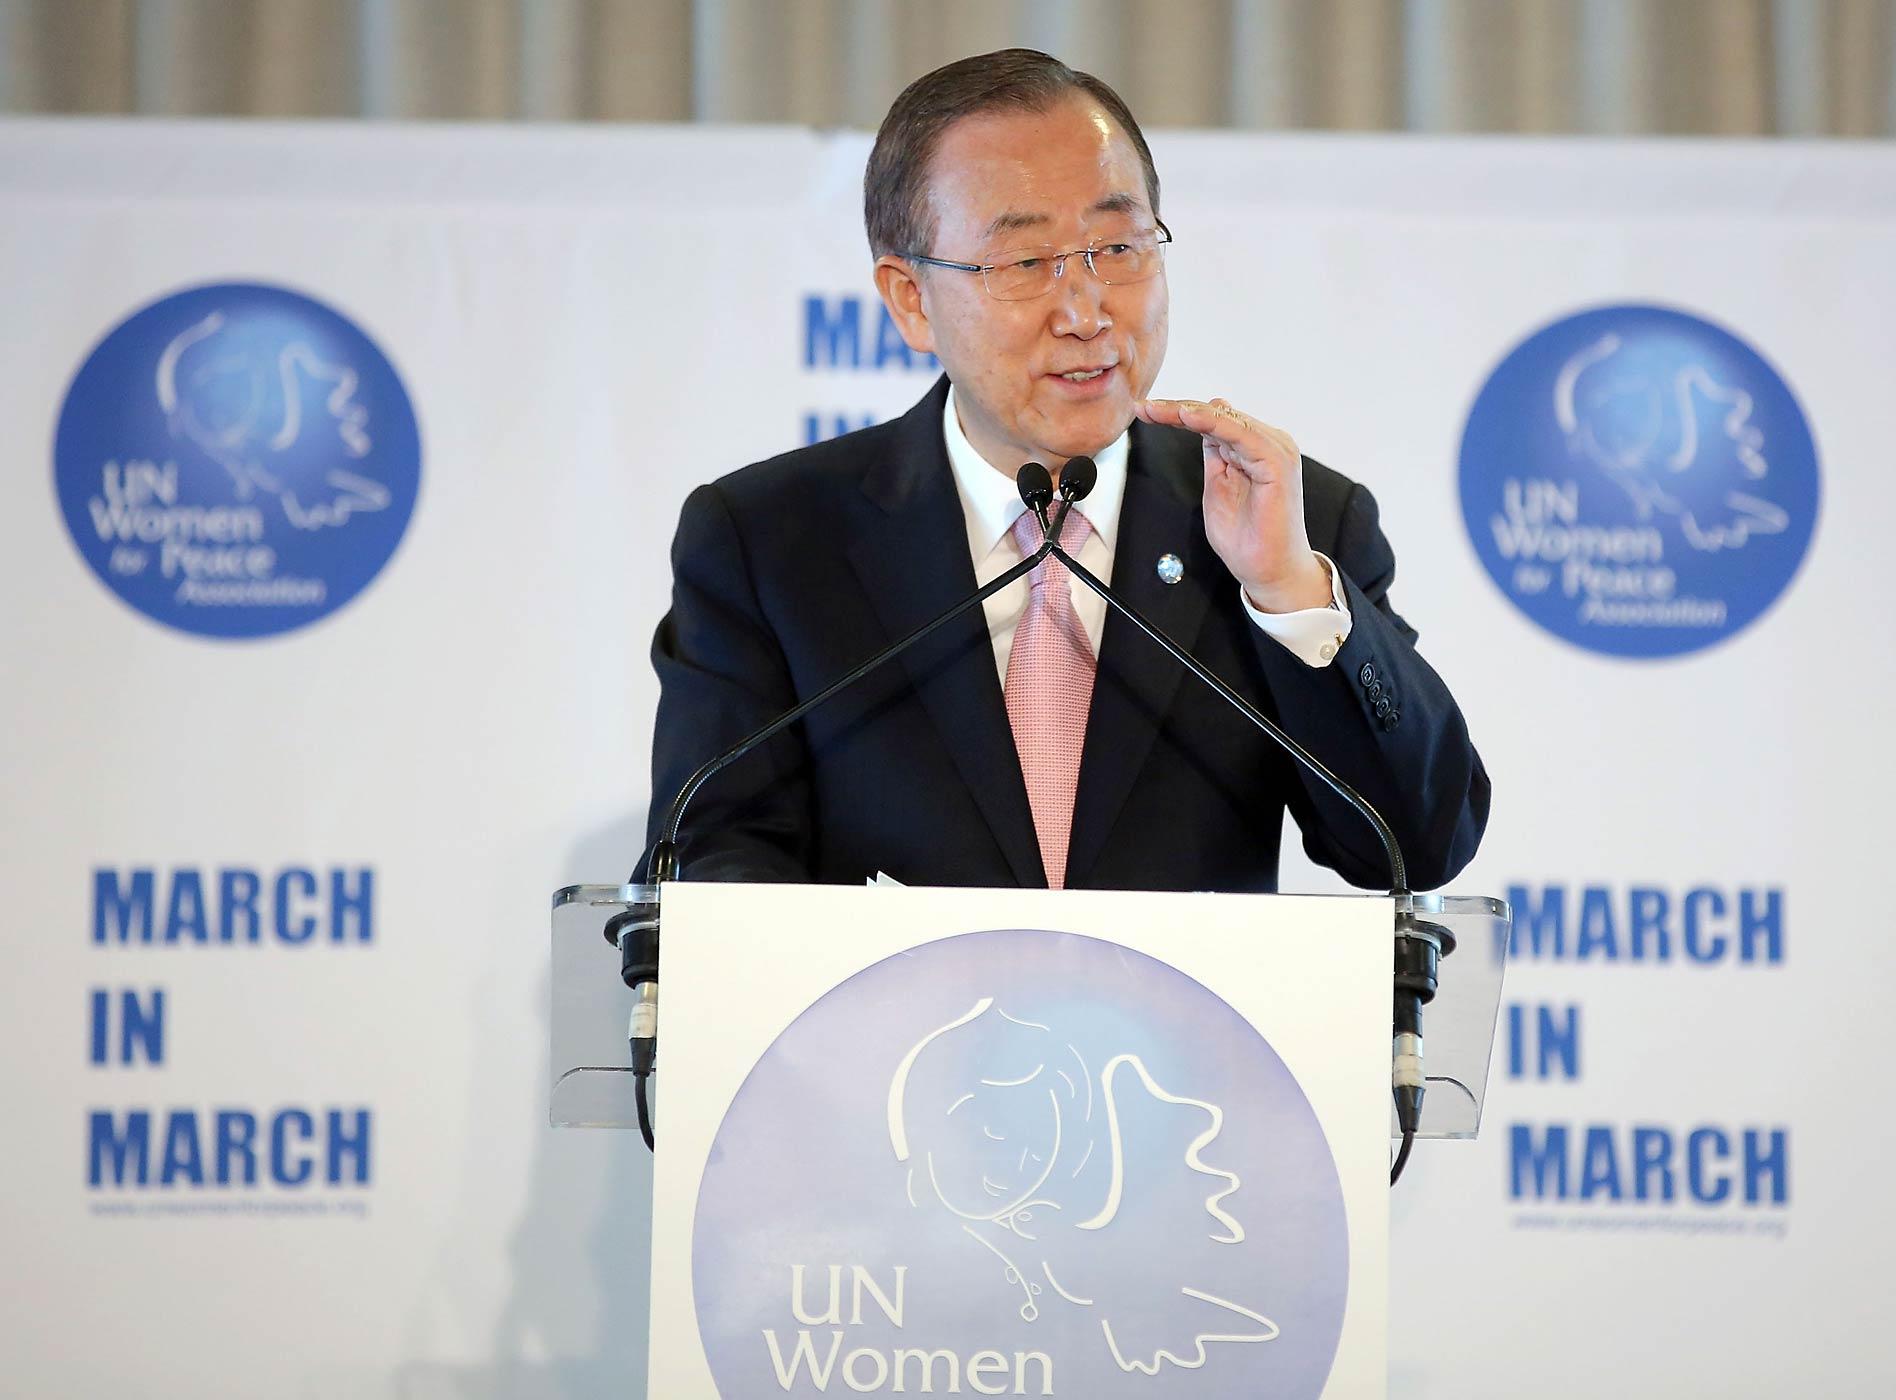 U.N. Secretary-General Ban Ki-moon speaks at the U.N. Women for Peace Association's International Women's Day celebration in New York City on March 6, 2015